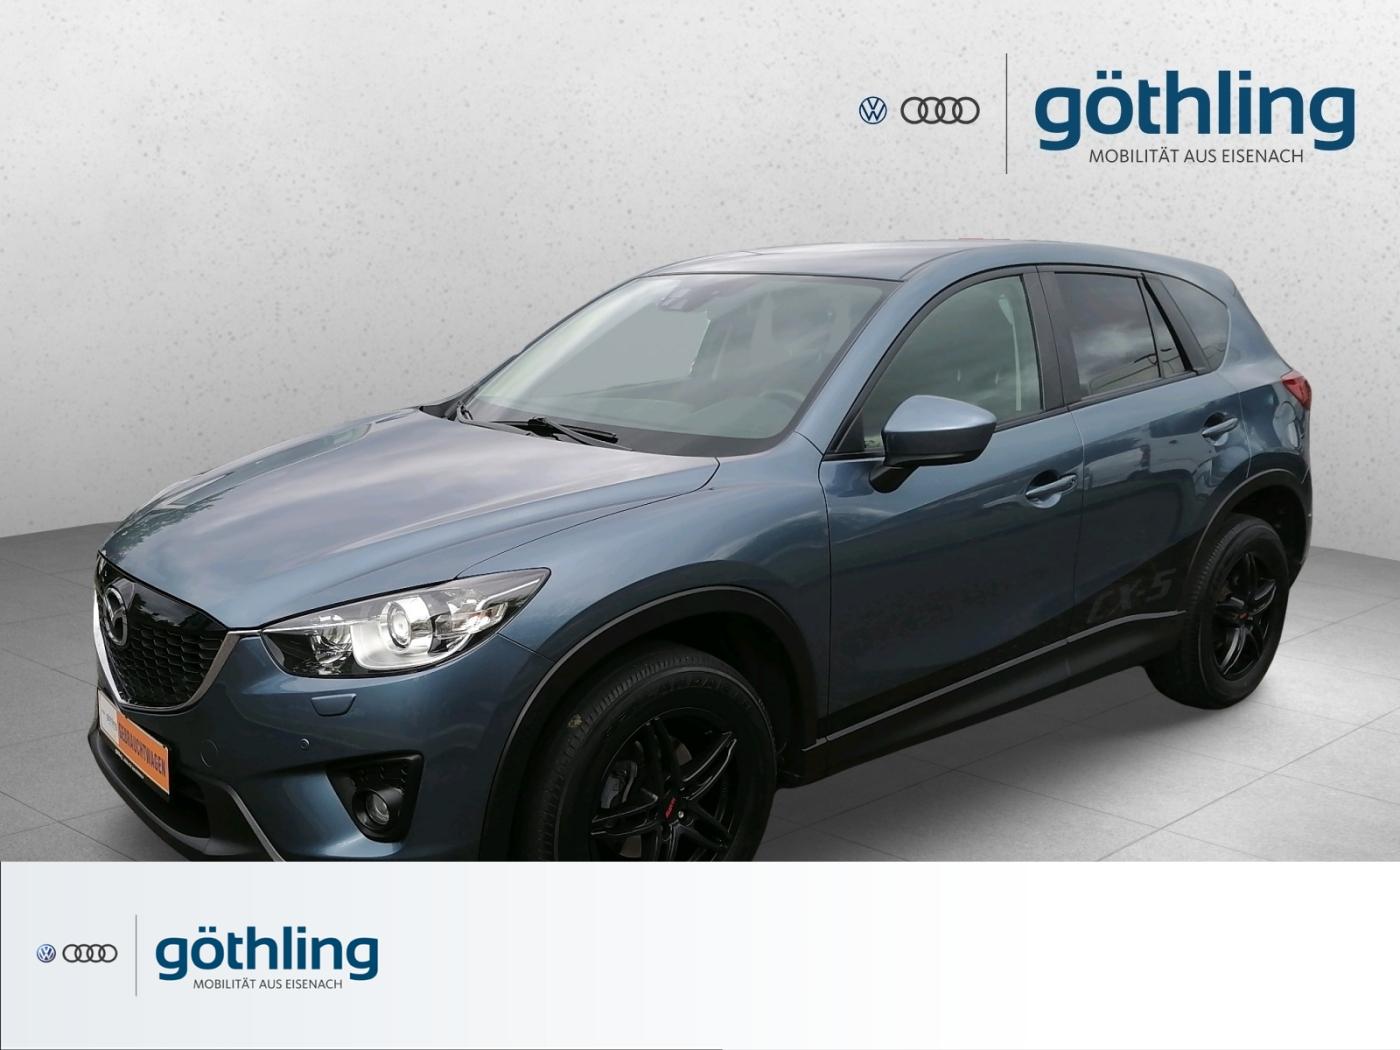 Mazda CX-5 Sendo 2.0 SKYACTIV-G Bi-Xenon*BOSE*Freispre, Jahr 2015, Benzin